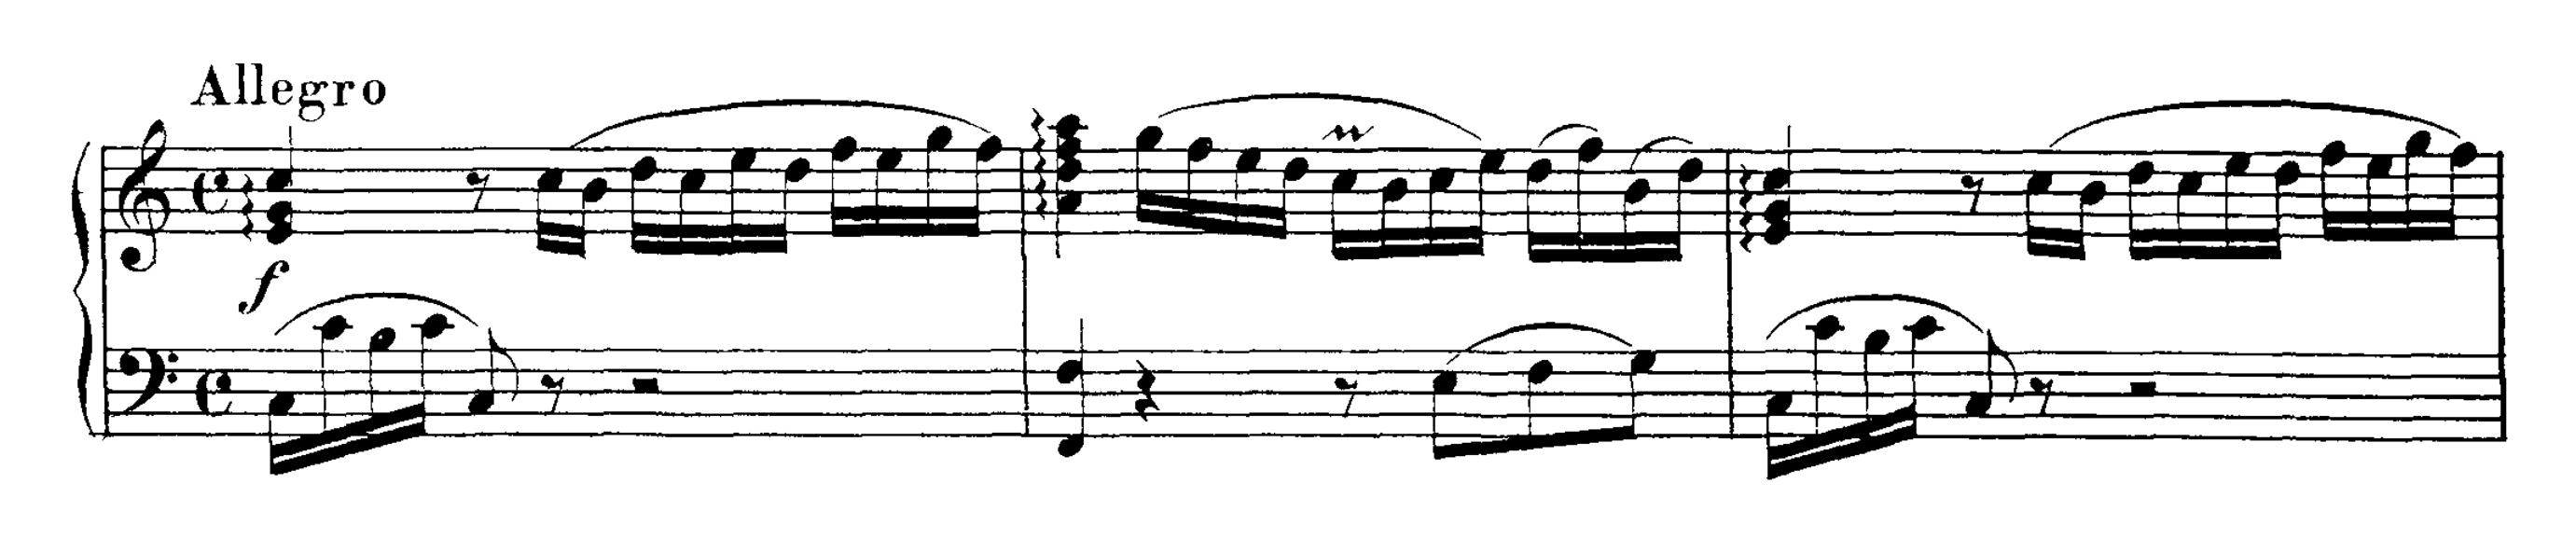 Mozart: Piano Sonata No 1 in C major, K 279 Analysis